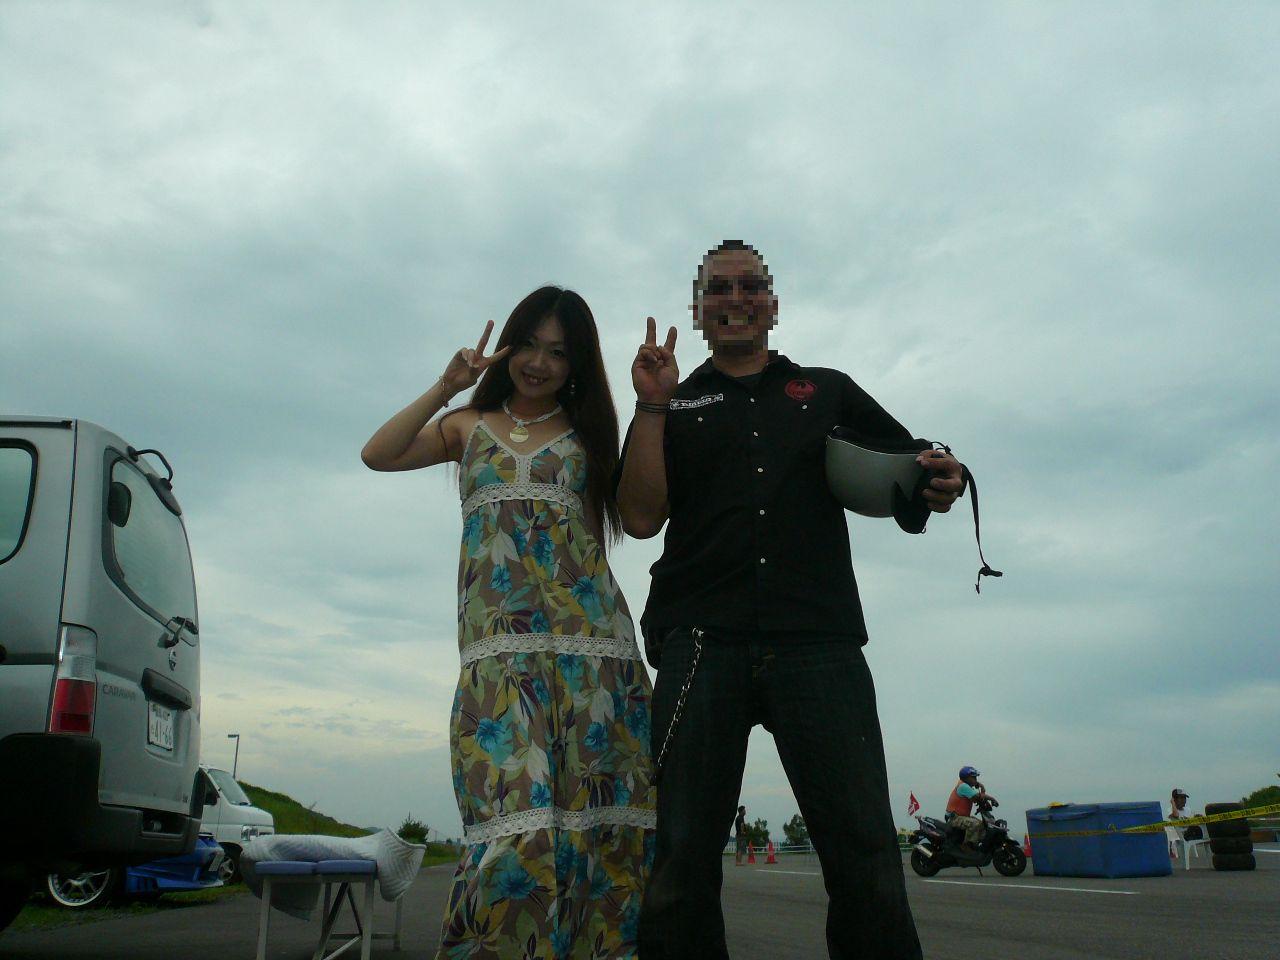 http://img.blogs.yahoo.co.jp/ybi/1/13/f5/tetsutaro499/folder/420377/img_420377_48744748_0?1248101758